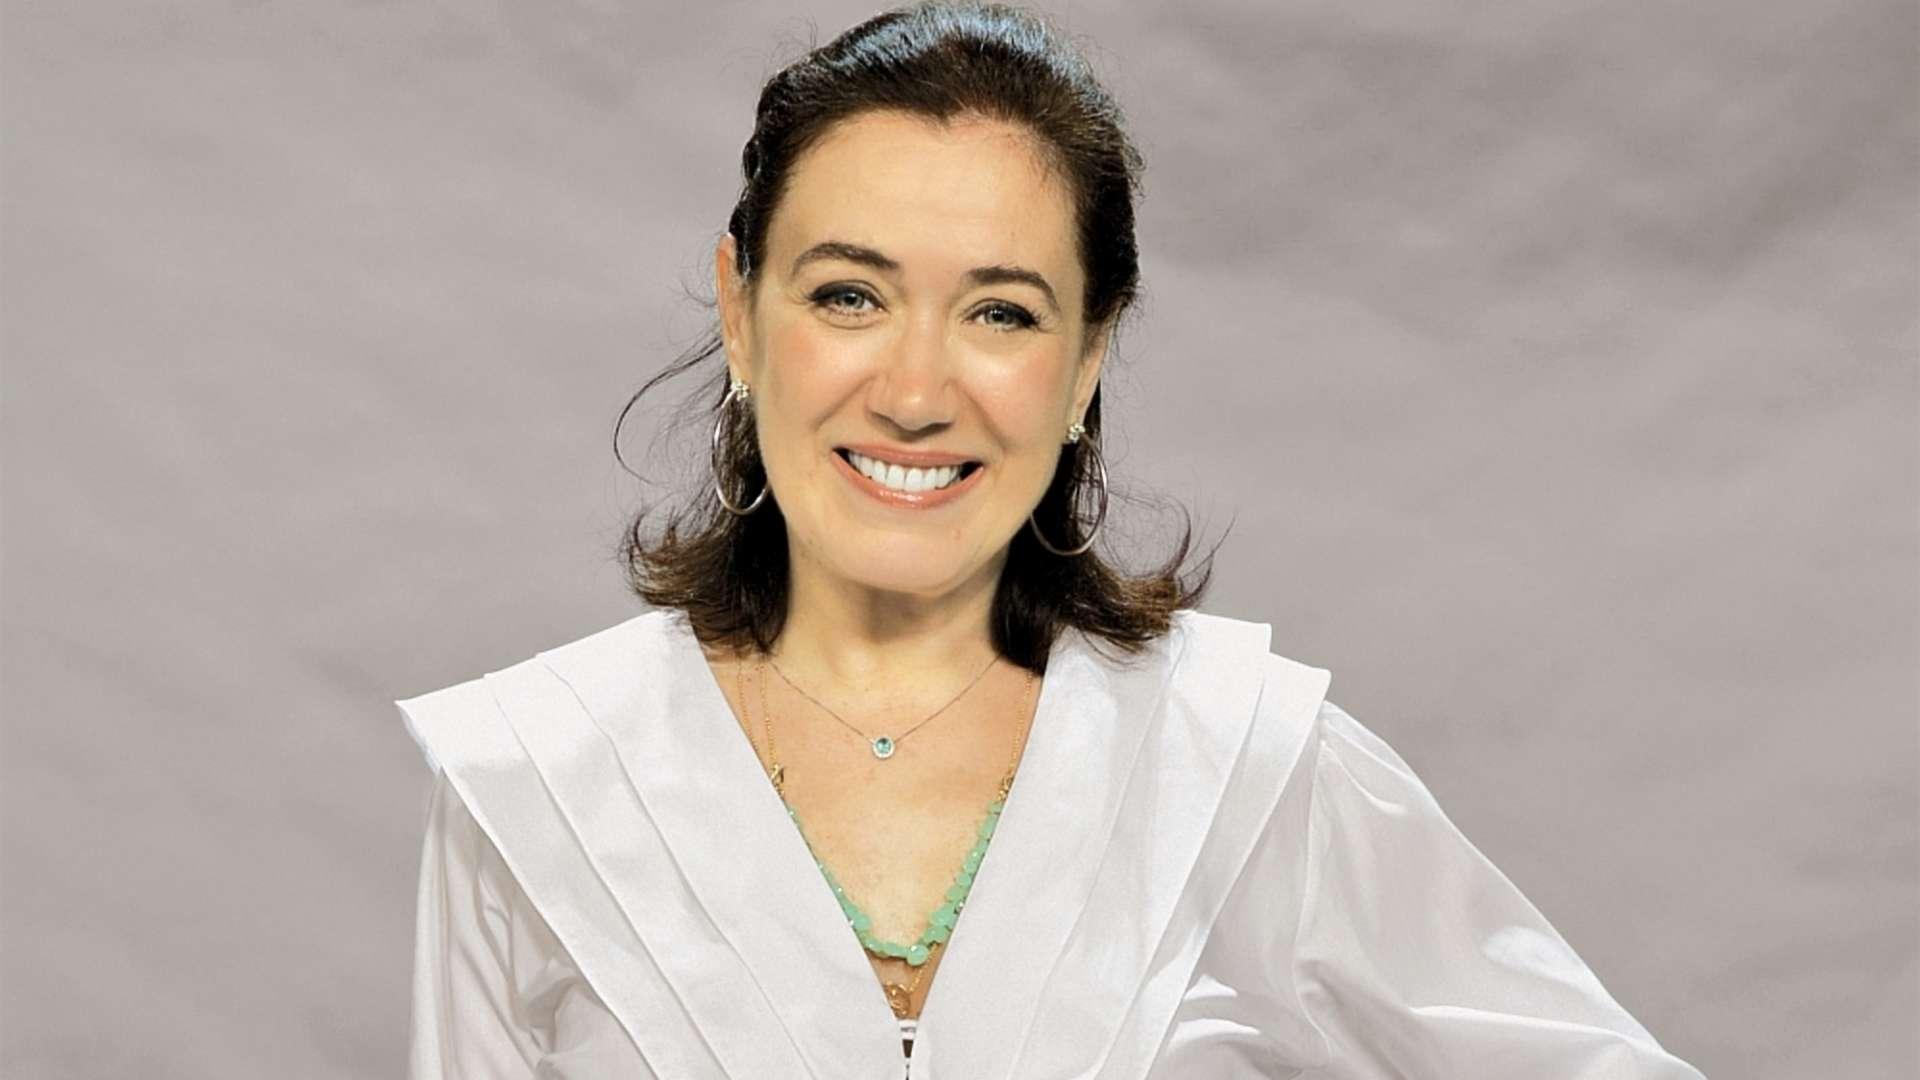 Lilia Cabral nega briga com Marina Ruy Barbosa: 'Pessoa que admiro'